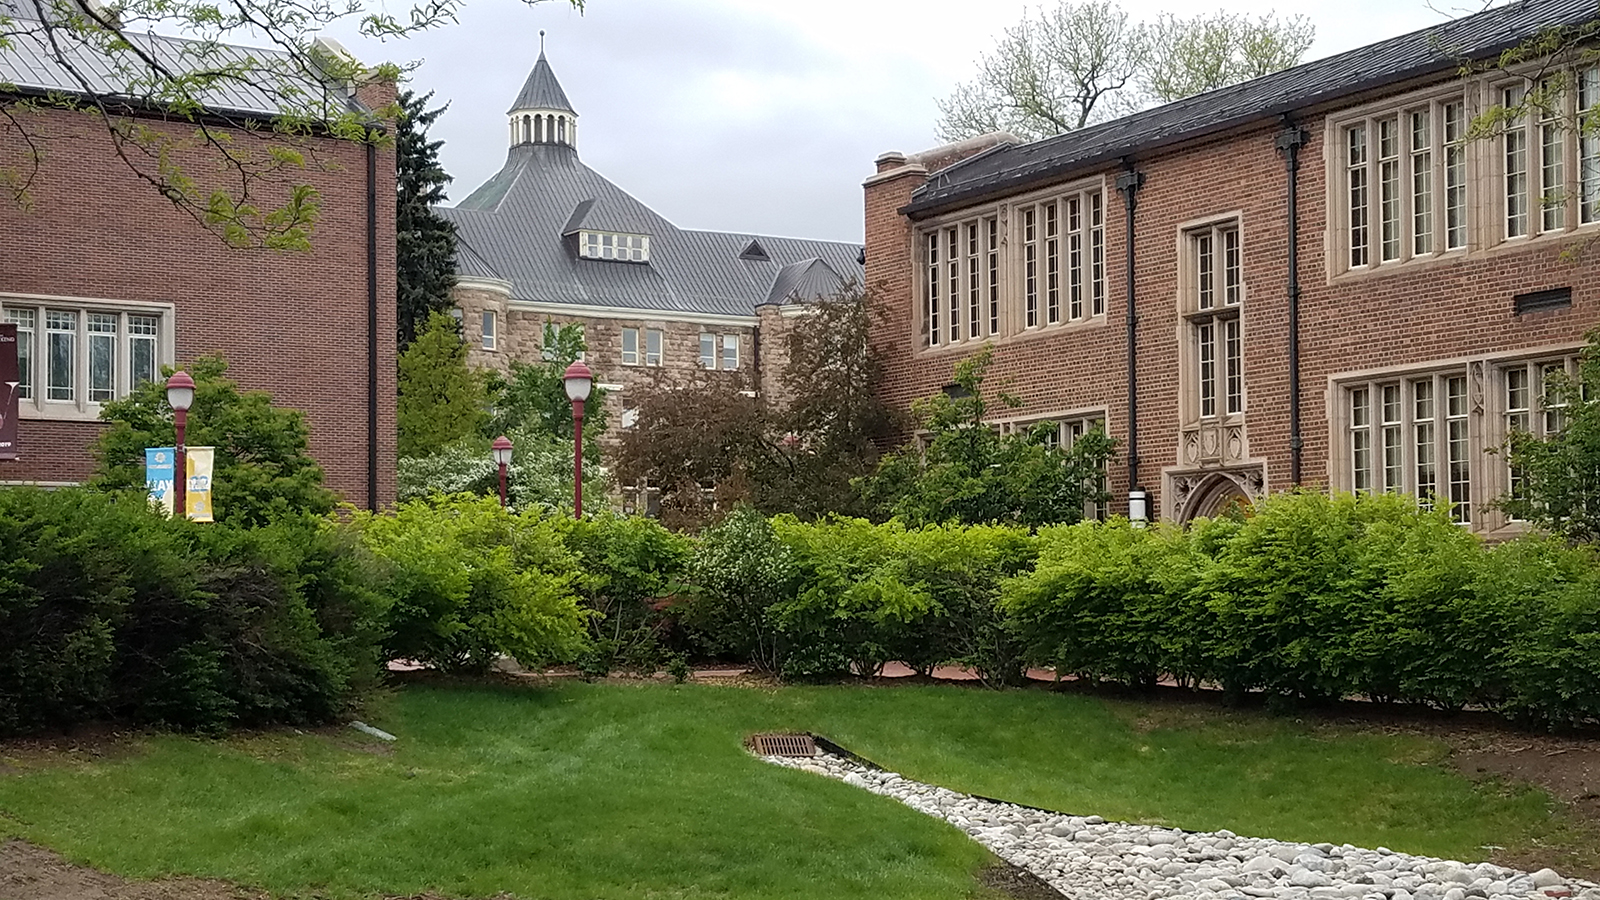 University of Denver campus.